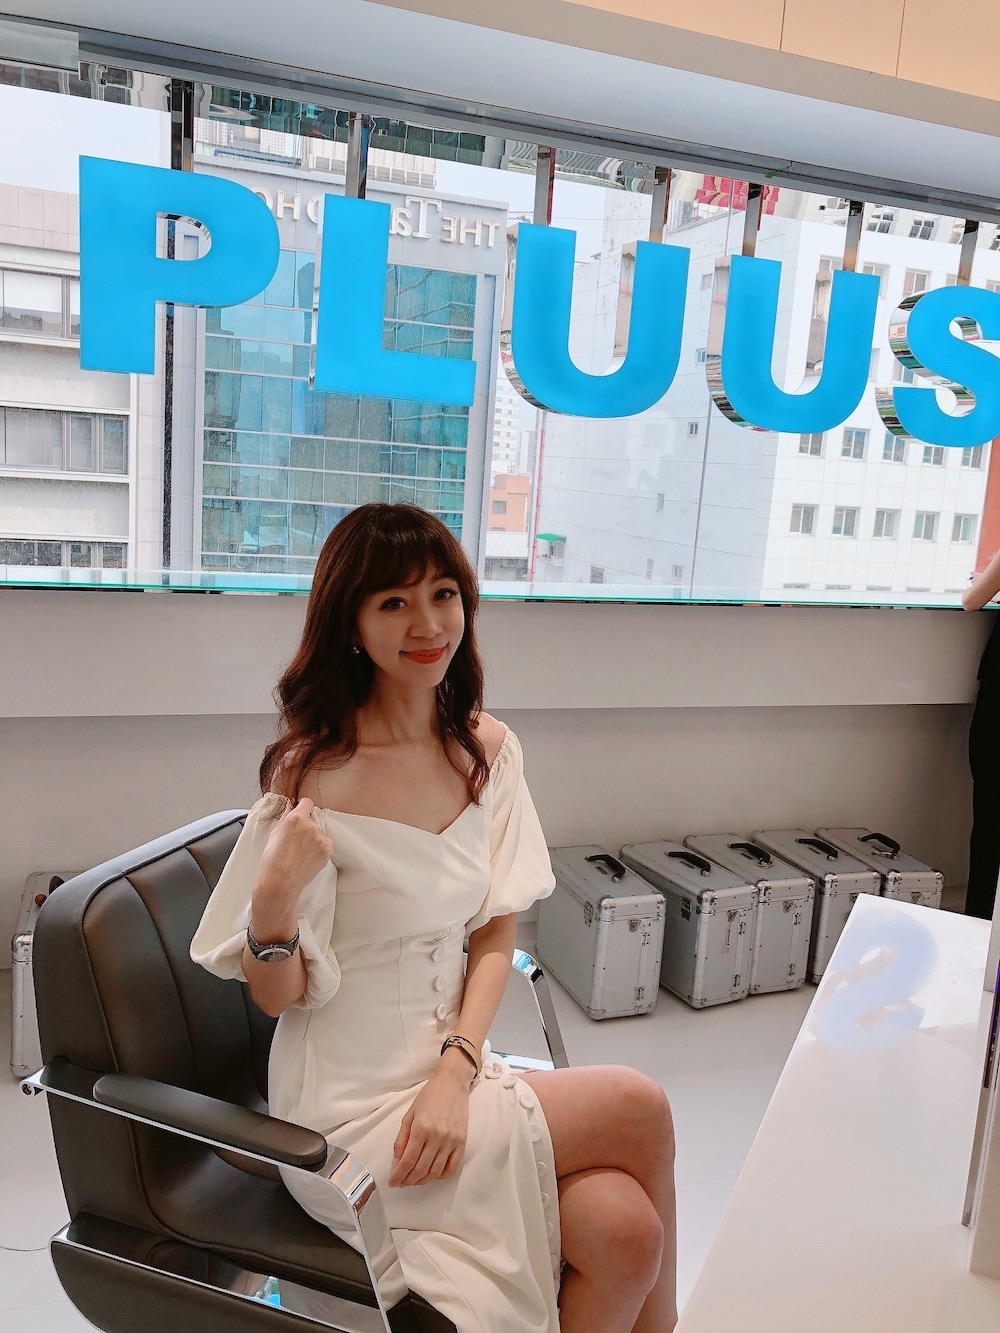 NEW!直擊新開幕 PLUUS中山Hi❤️ 2020 髮型新趨勢就是要捲髮『 PLUUS 魔晶染/燙』 髮質柔亮不受損的新選擇❤️中山站髮廊首選推薦(≧∇≦)/